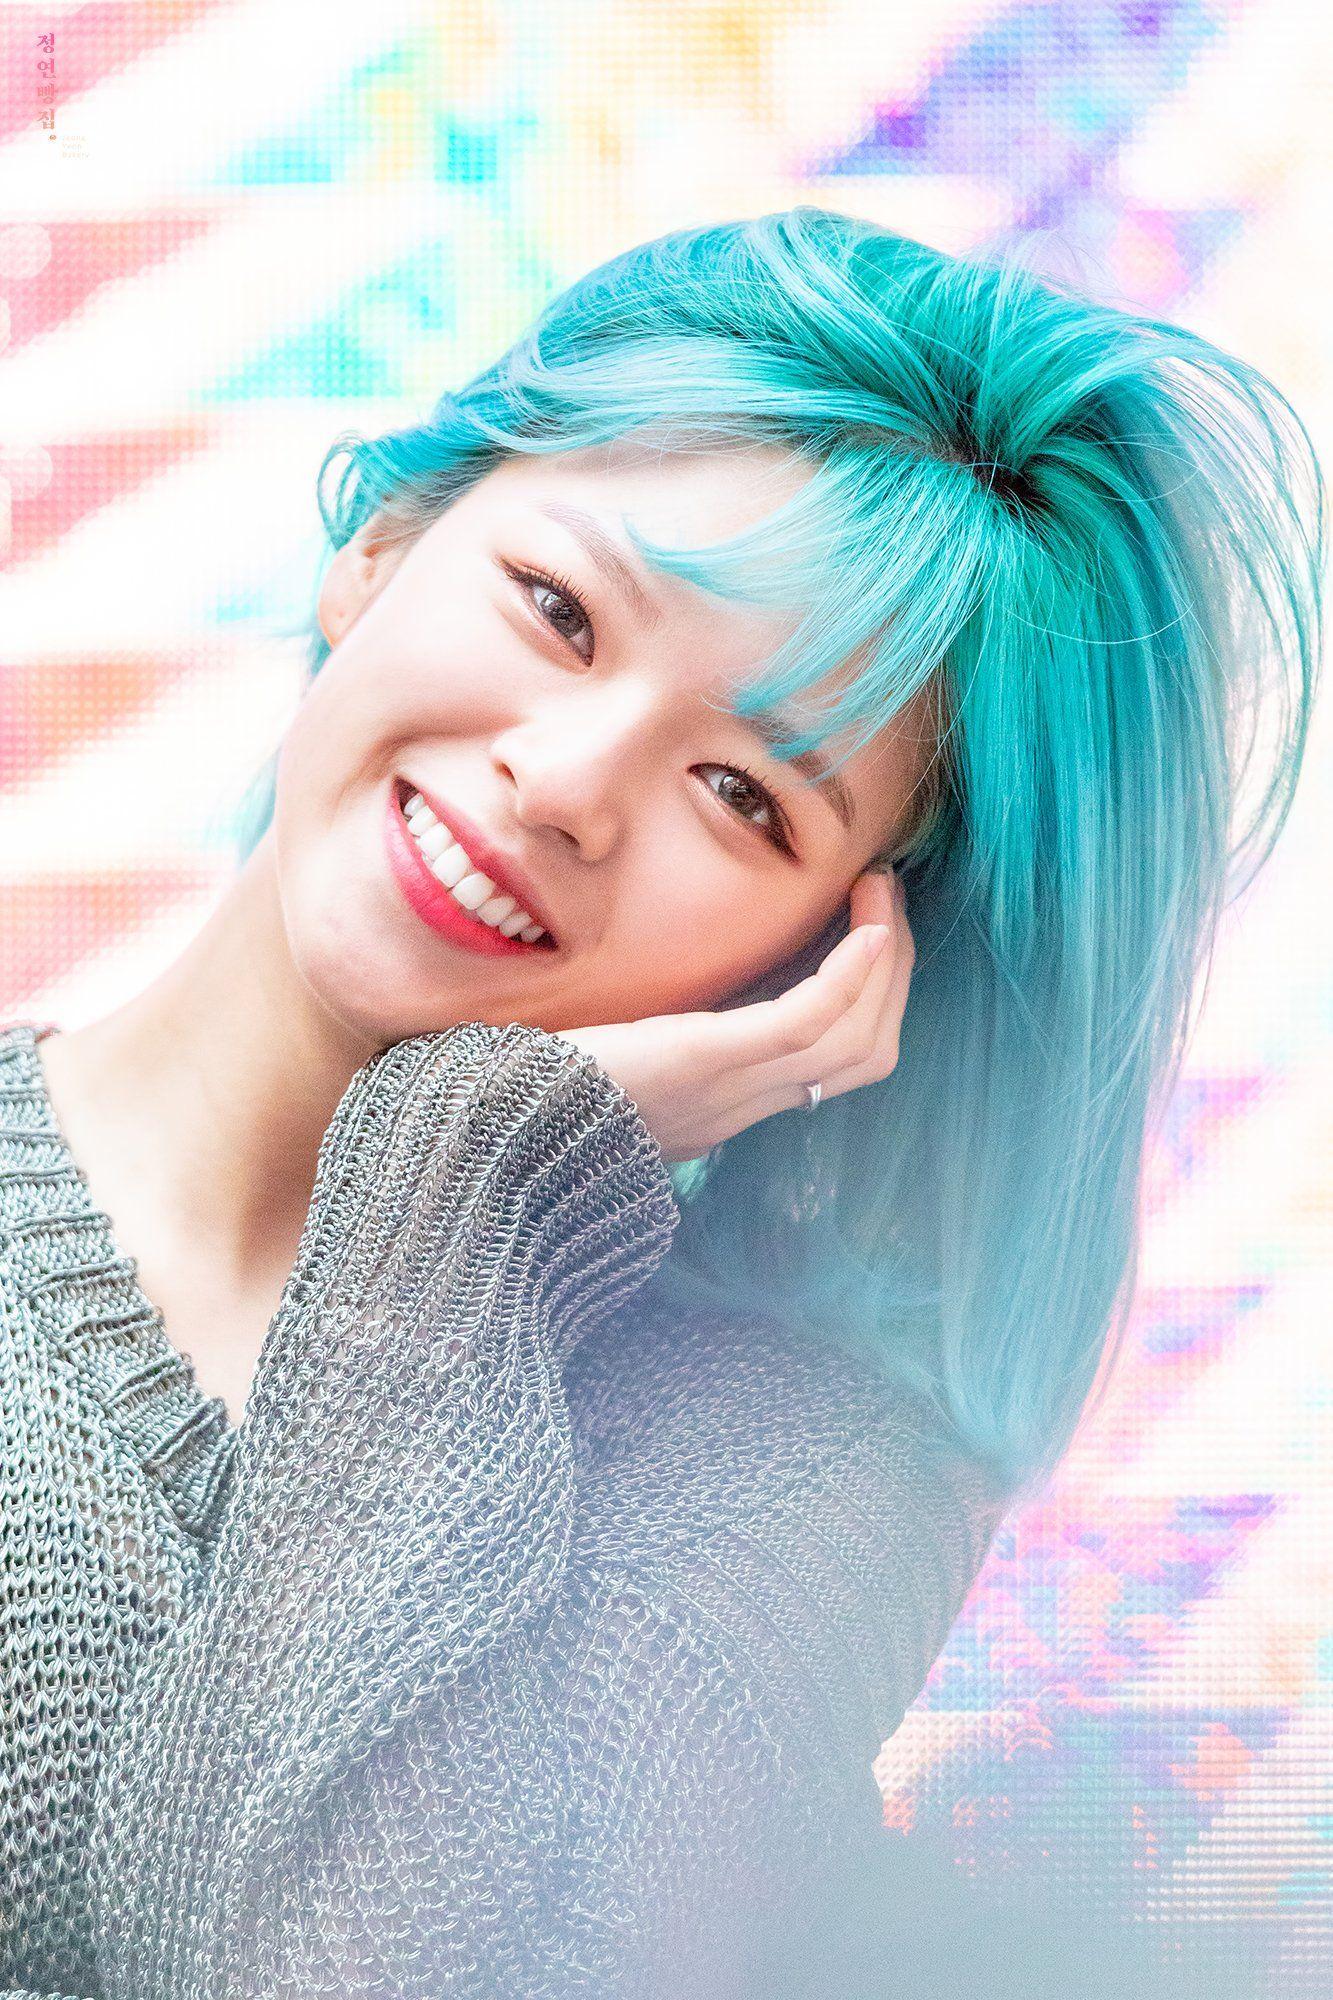 Jeongyeon kpop kdrama bts exo kpoparmy kpop girl